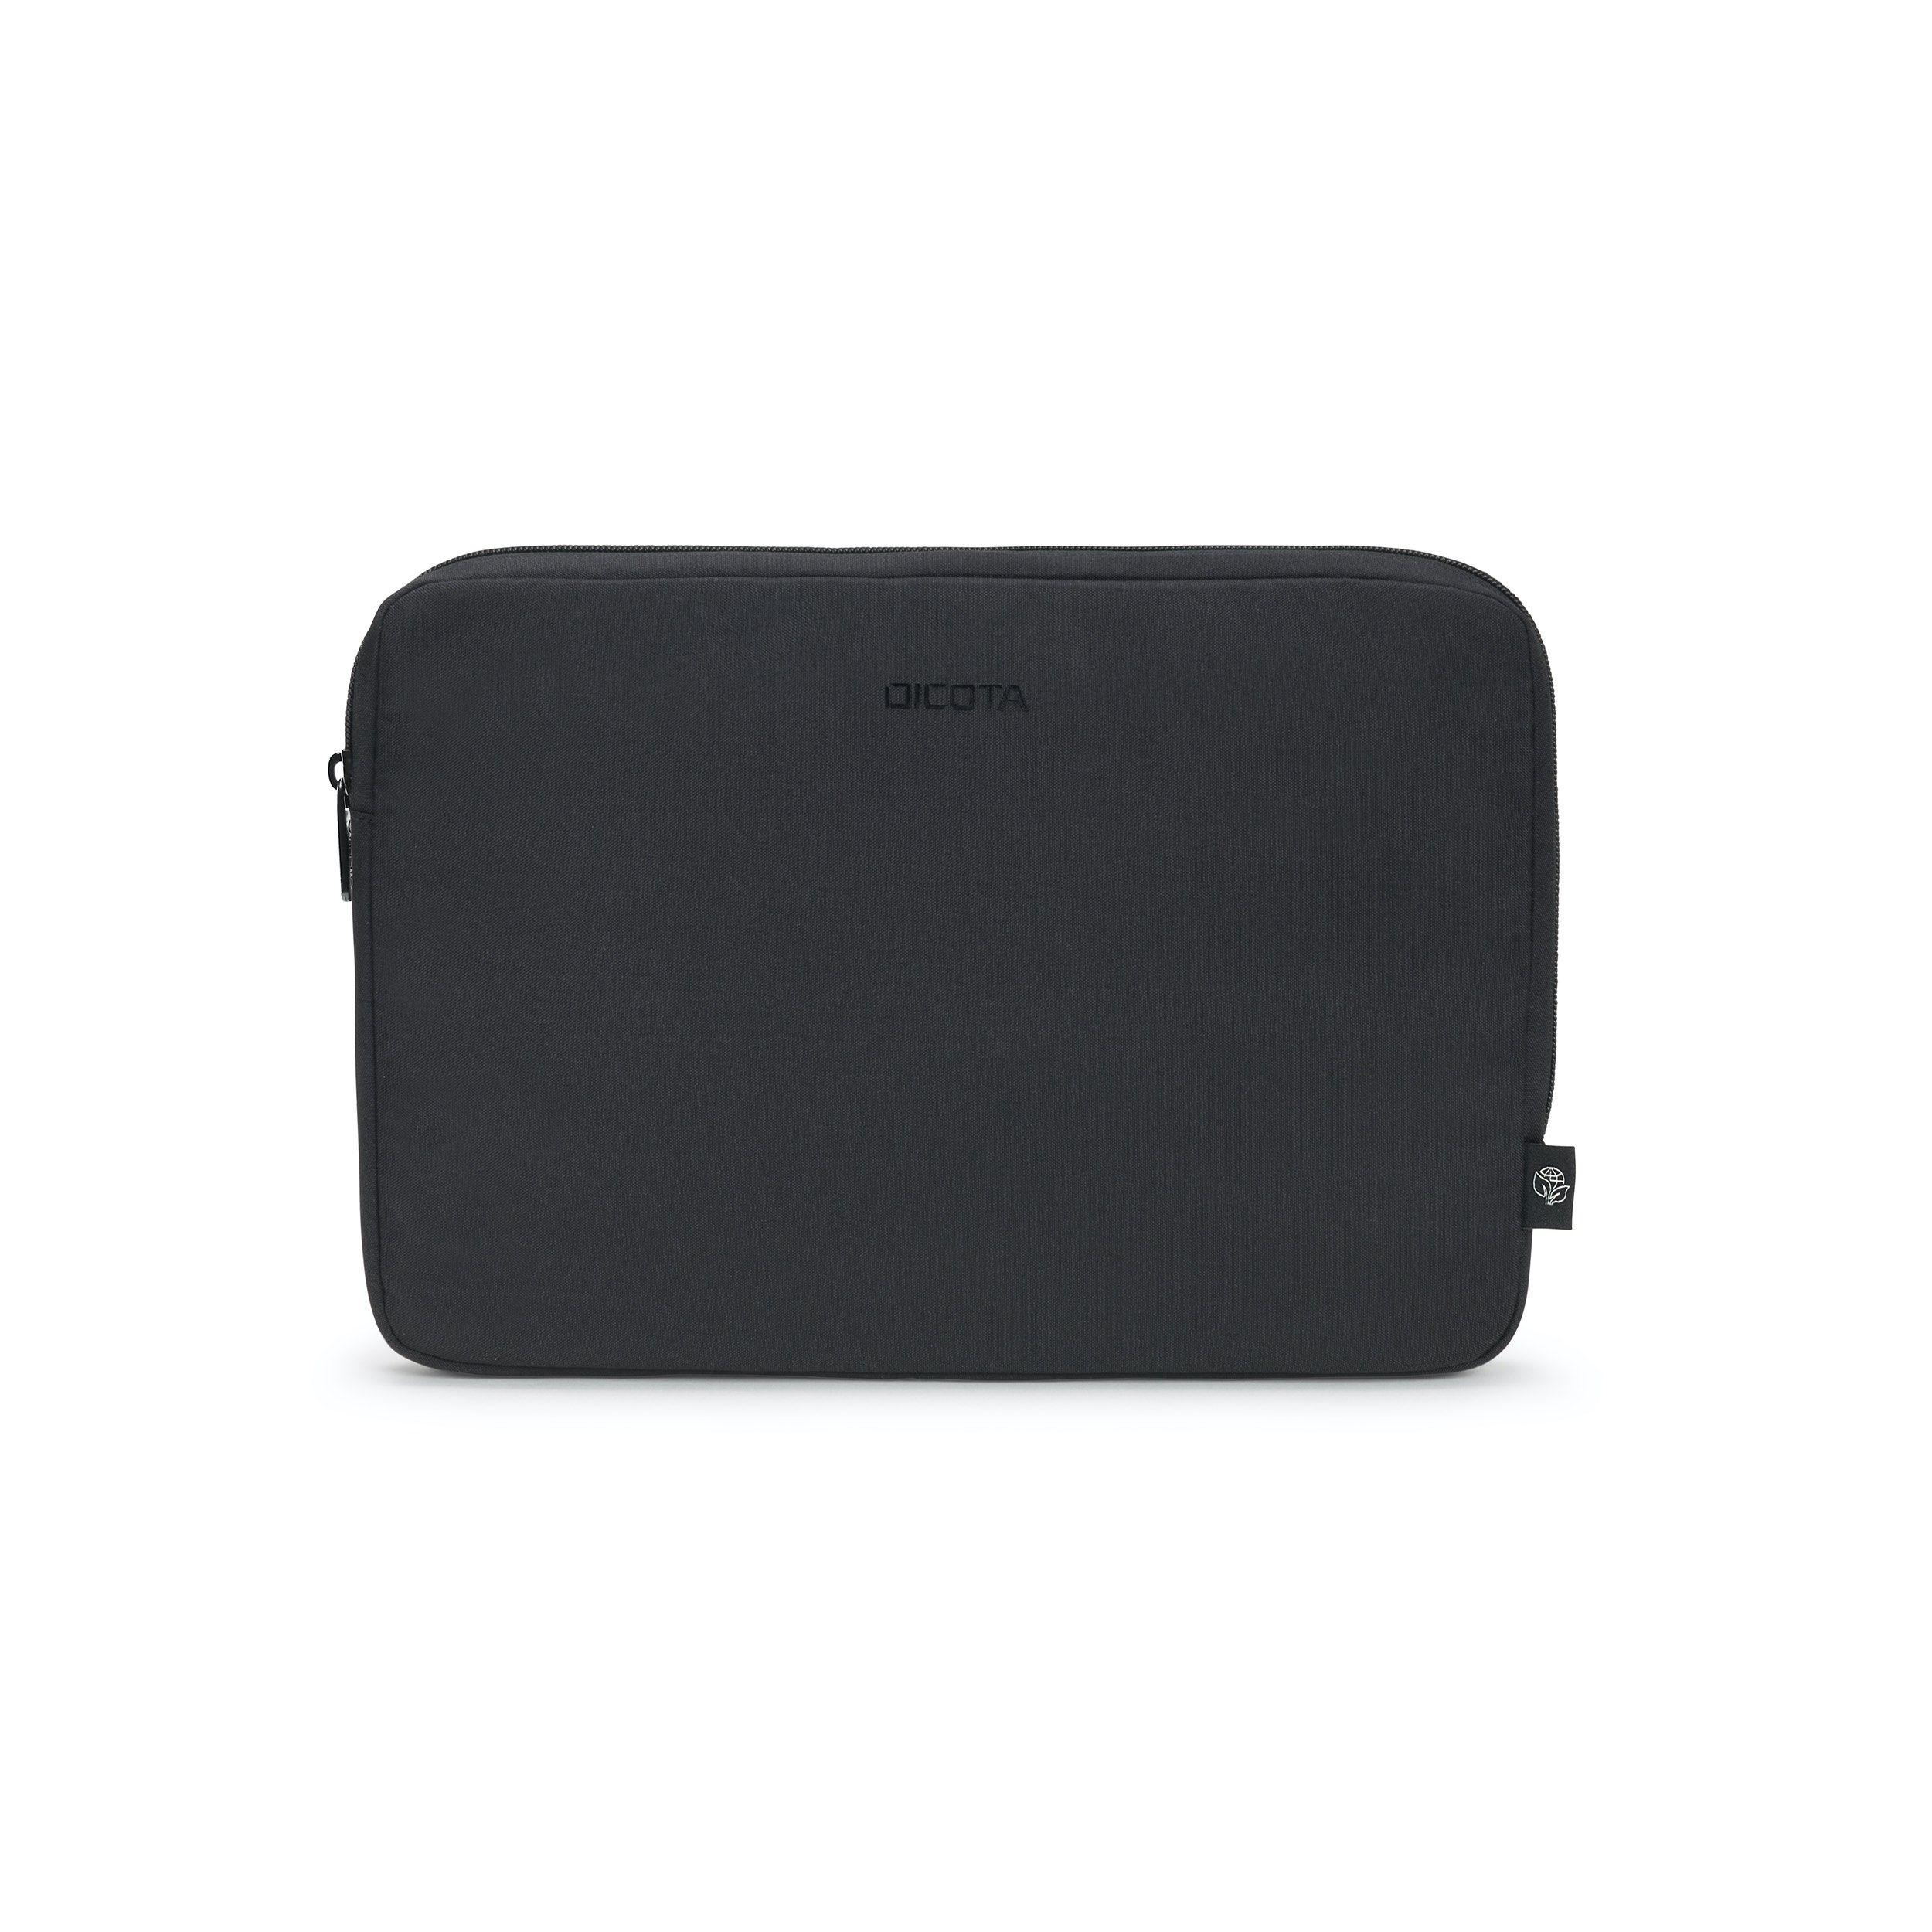 DICOTA ECO Sleeve BASE 15-15.6 black - D31826